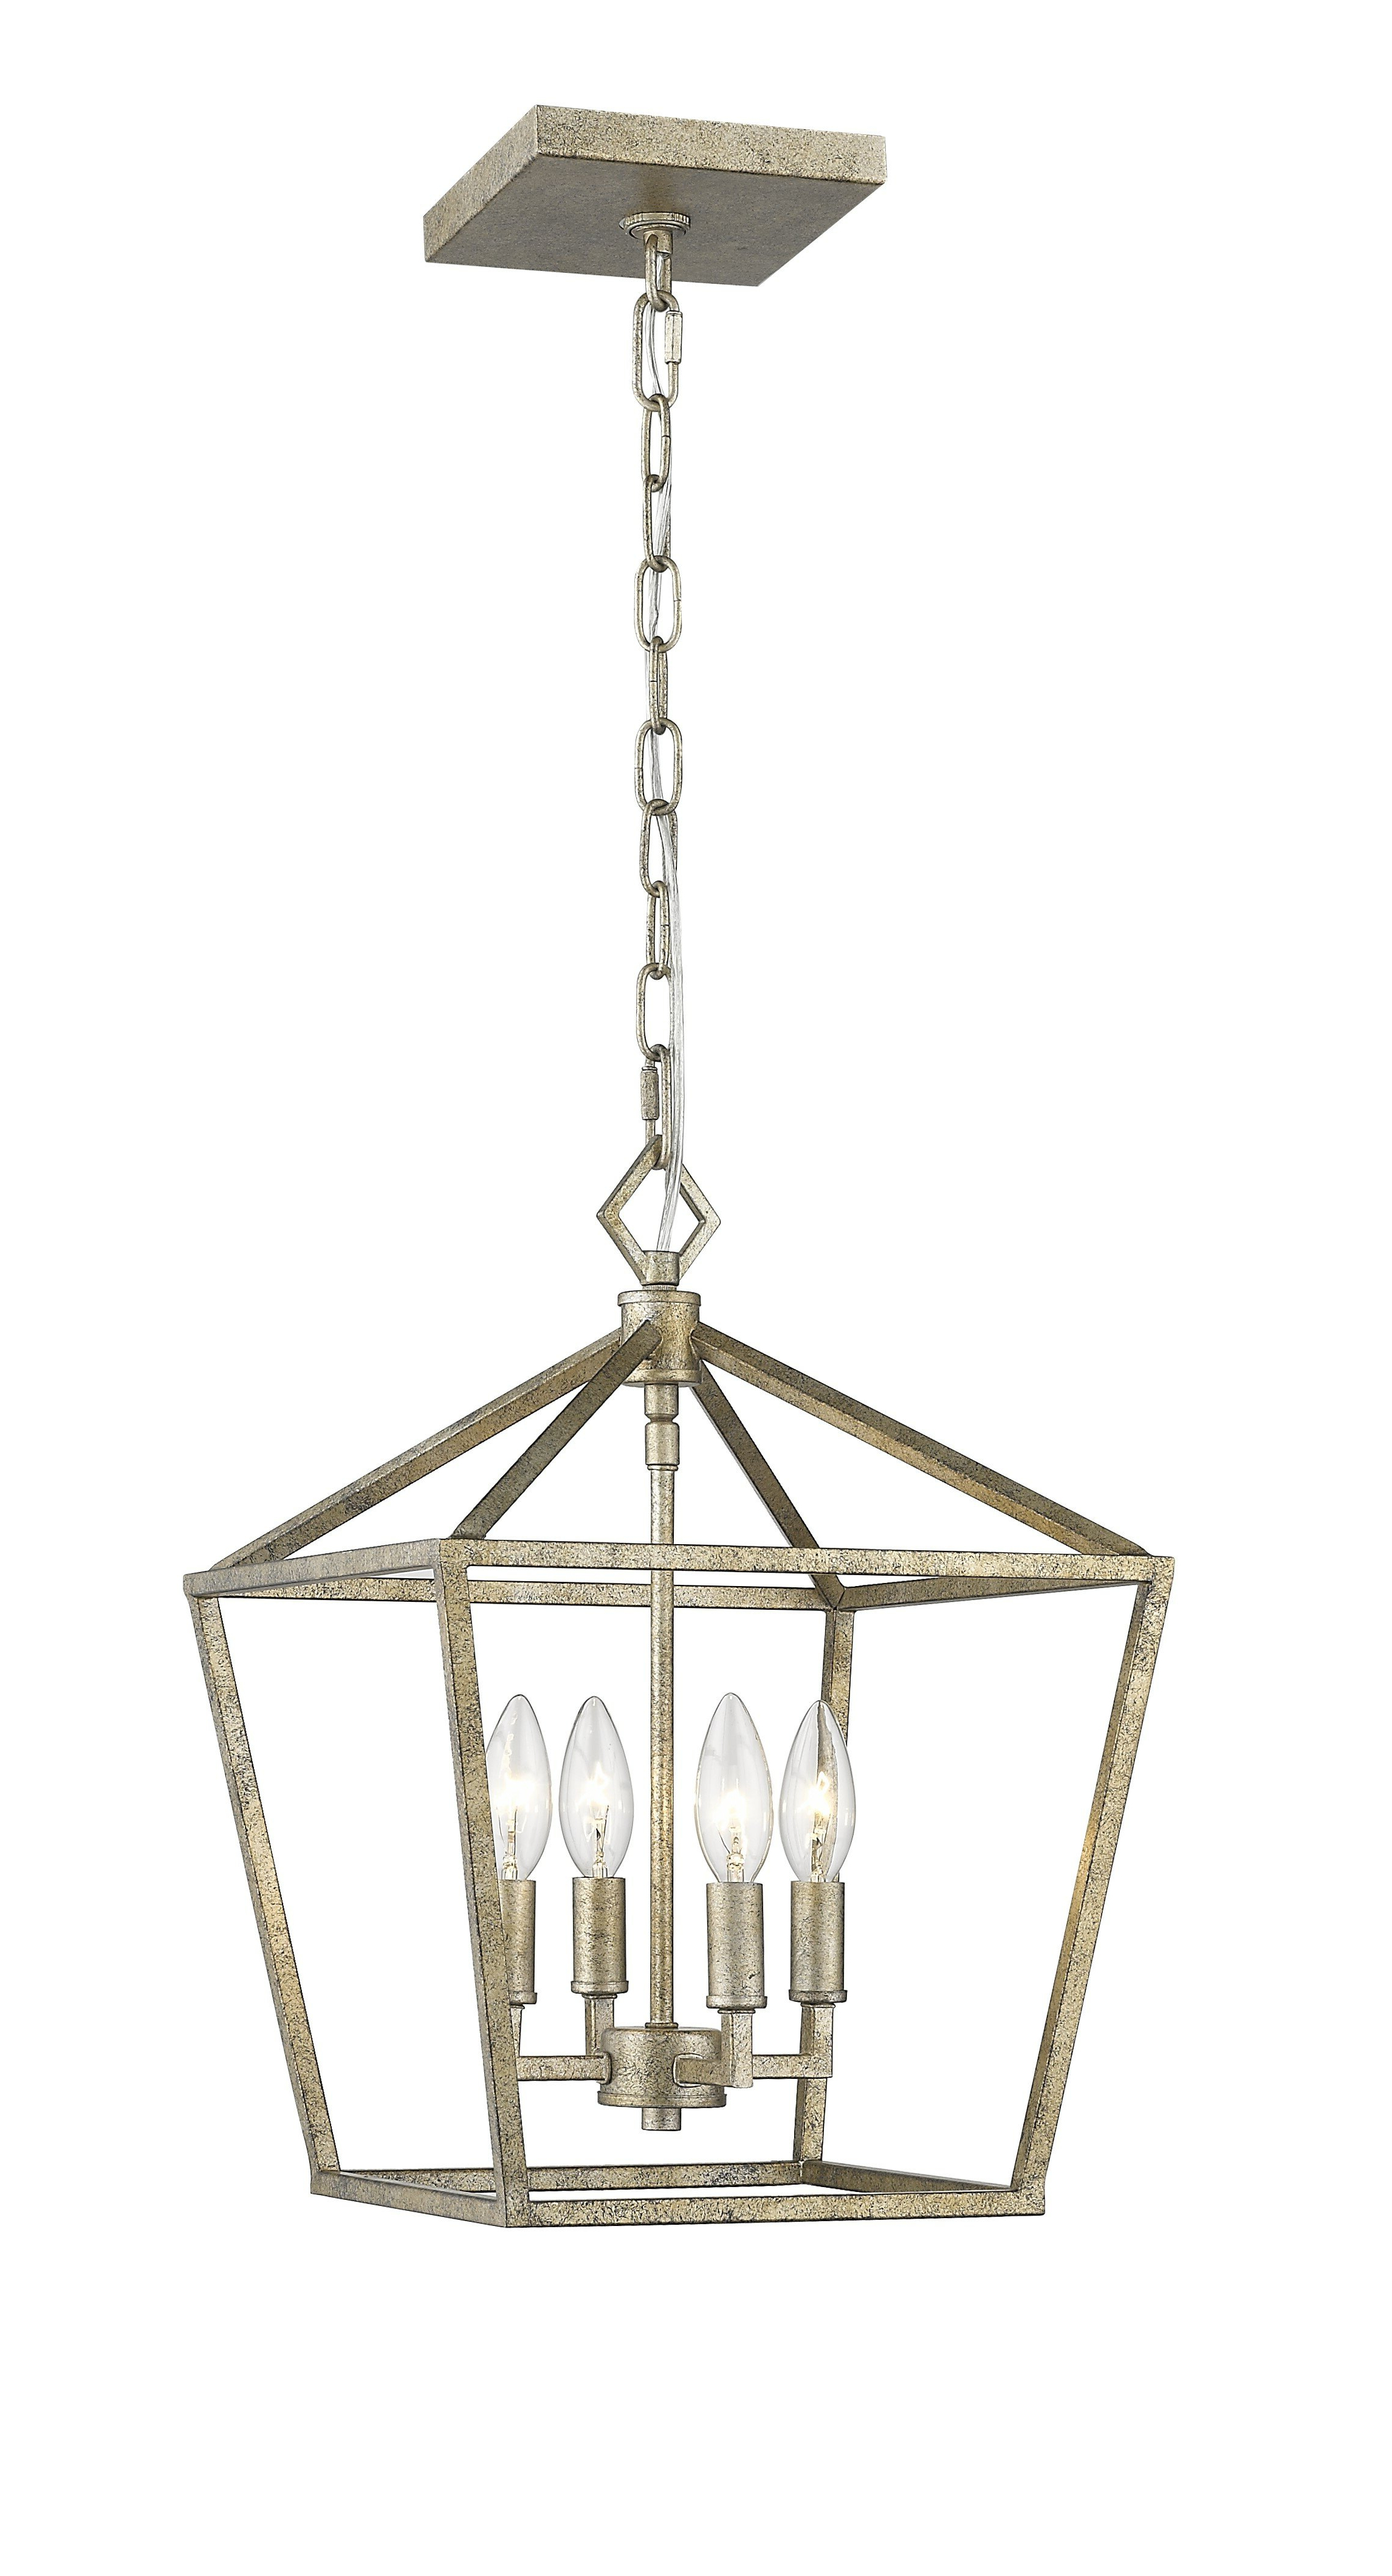 Varnum 4 Light Lantern Pendants For Most Up To Date Varnum 4 Light Lantern Pendant (View 15 of 20)